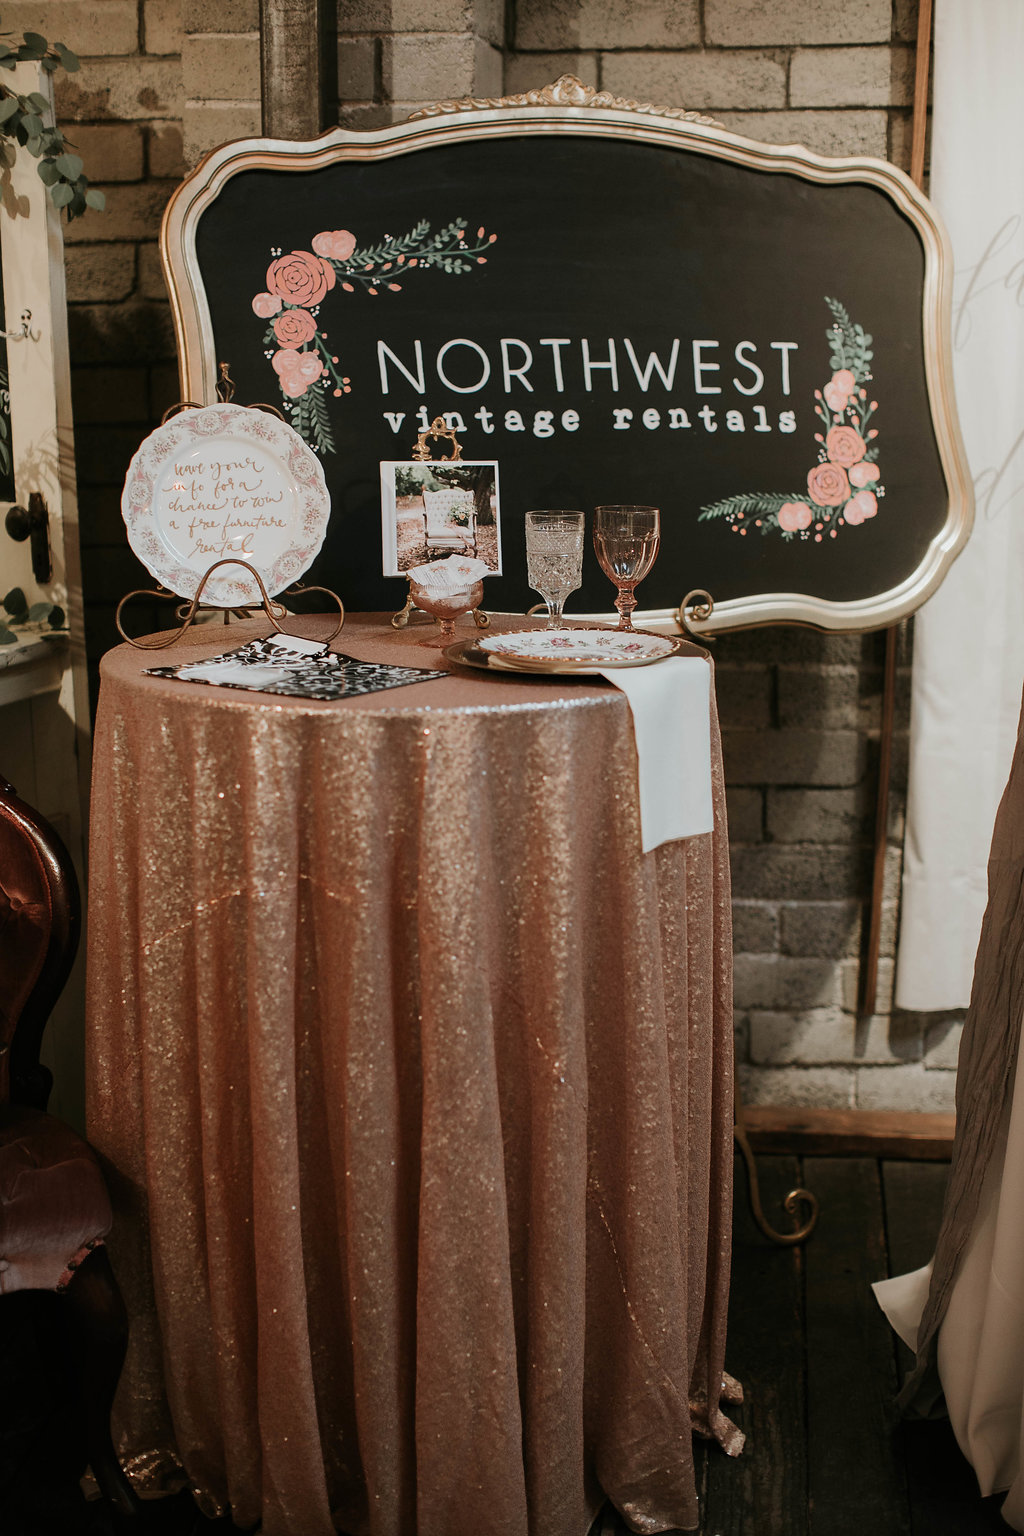 The_Big_Fake_wedding_Seattle_Within_sodo_wedding_by_Adina_Preston_Weddings_223.JPG